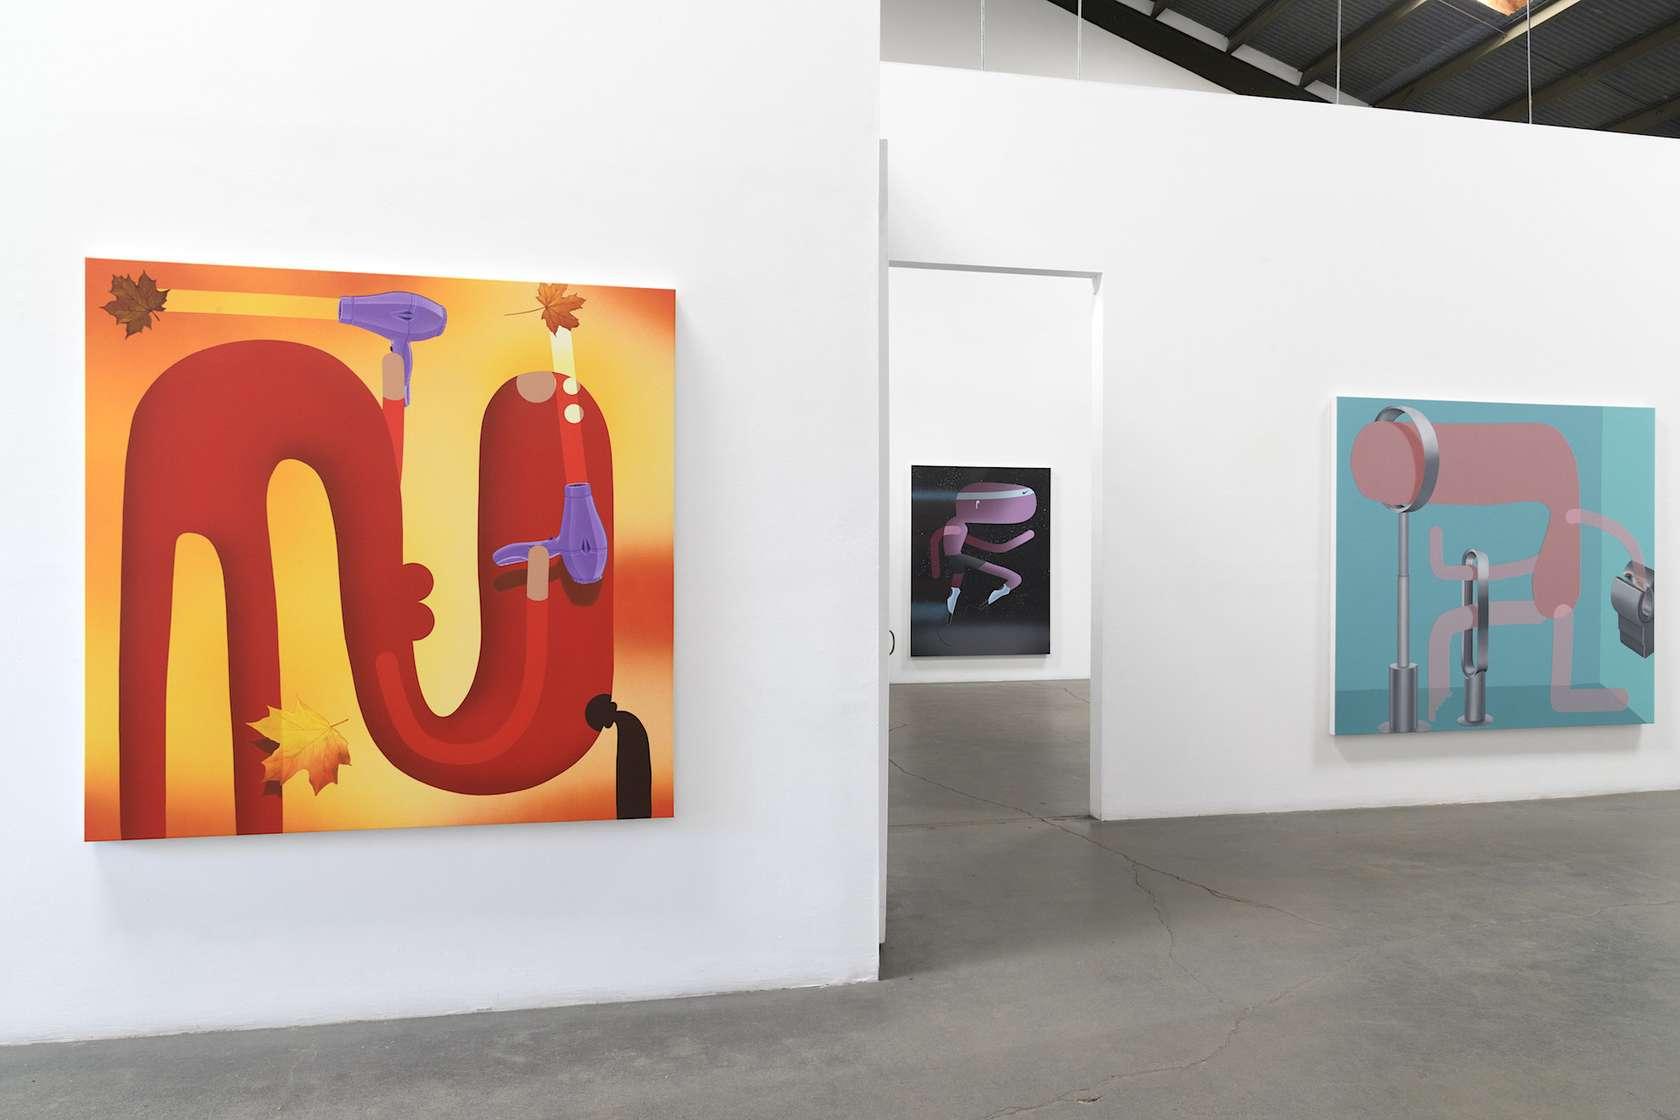 Oli Epp, Contactless - Richard Heller Gallery - Santa Monica (US) 16 mars  — 27 avril 2019